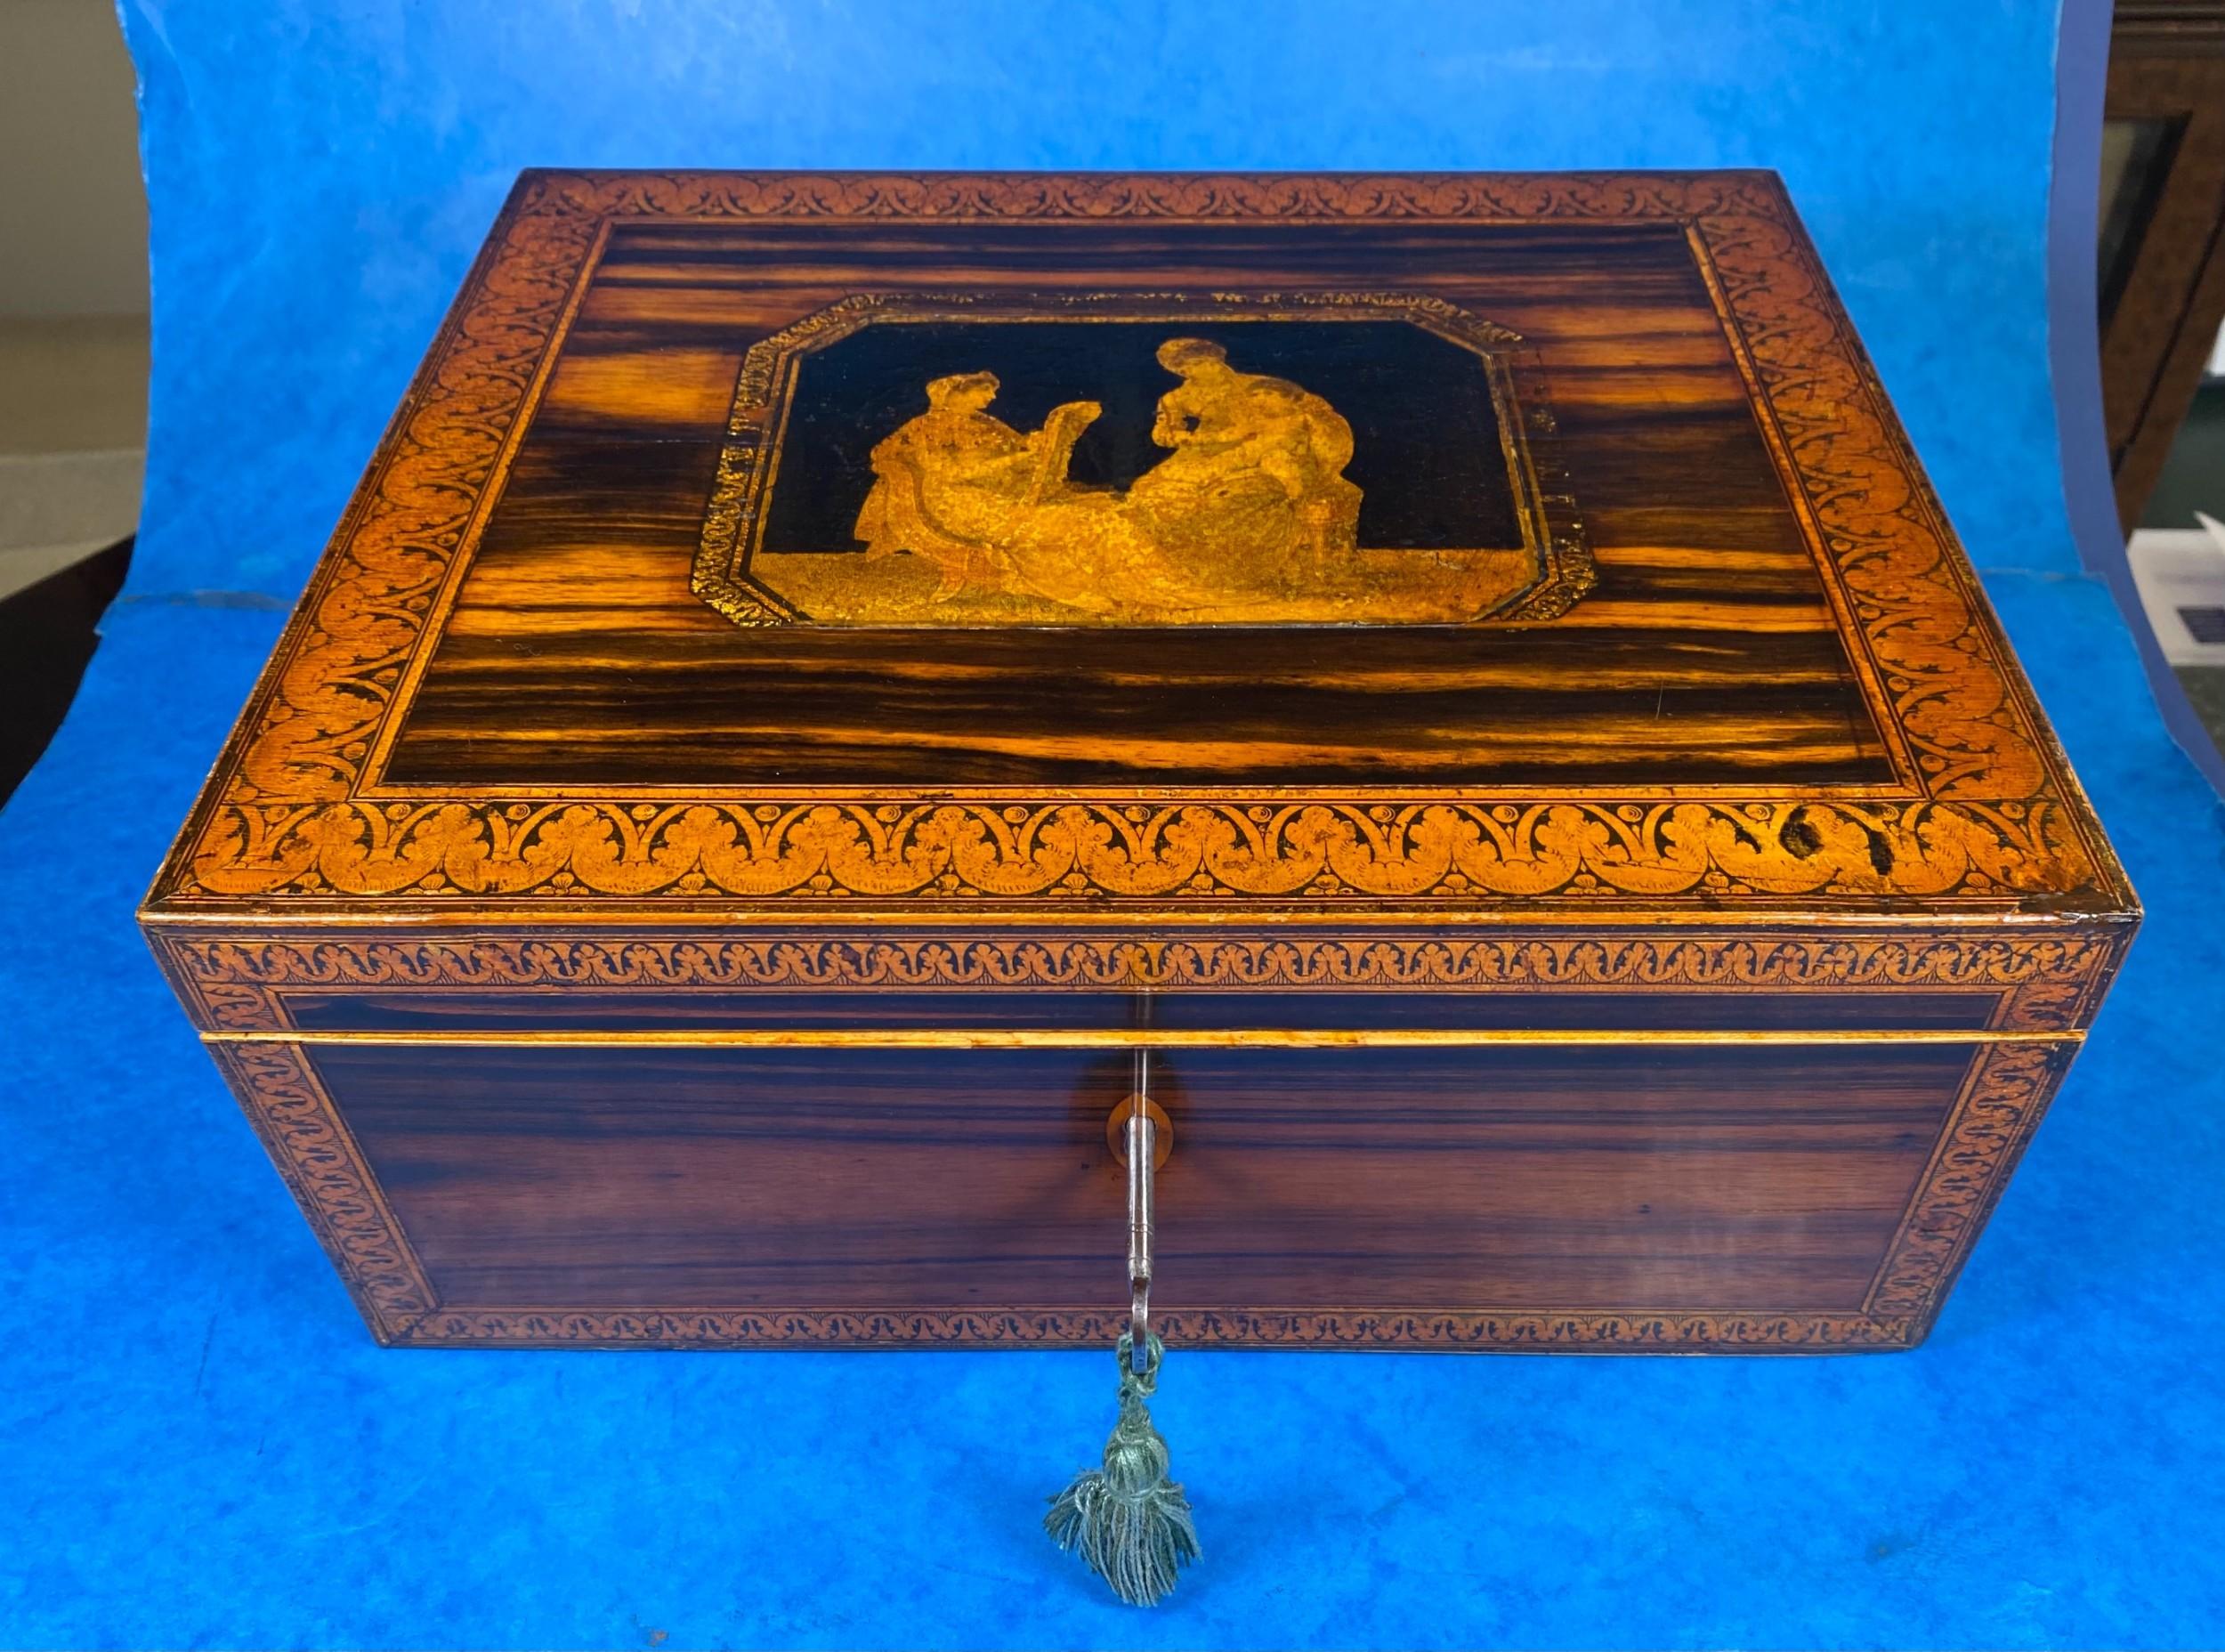 regency penwork coromandel jewellery box